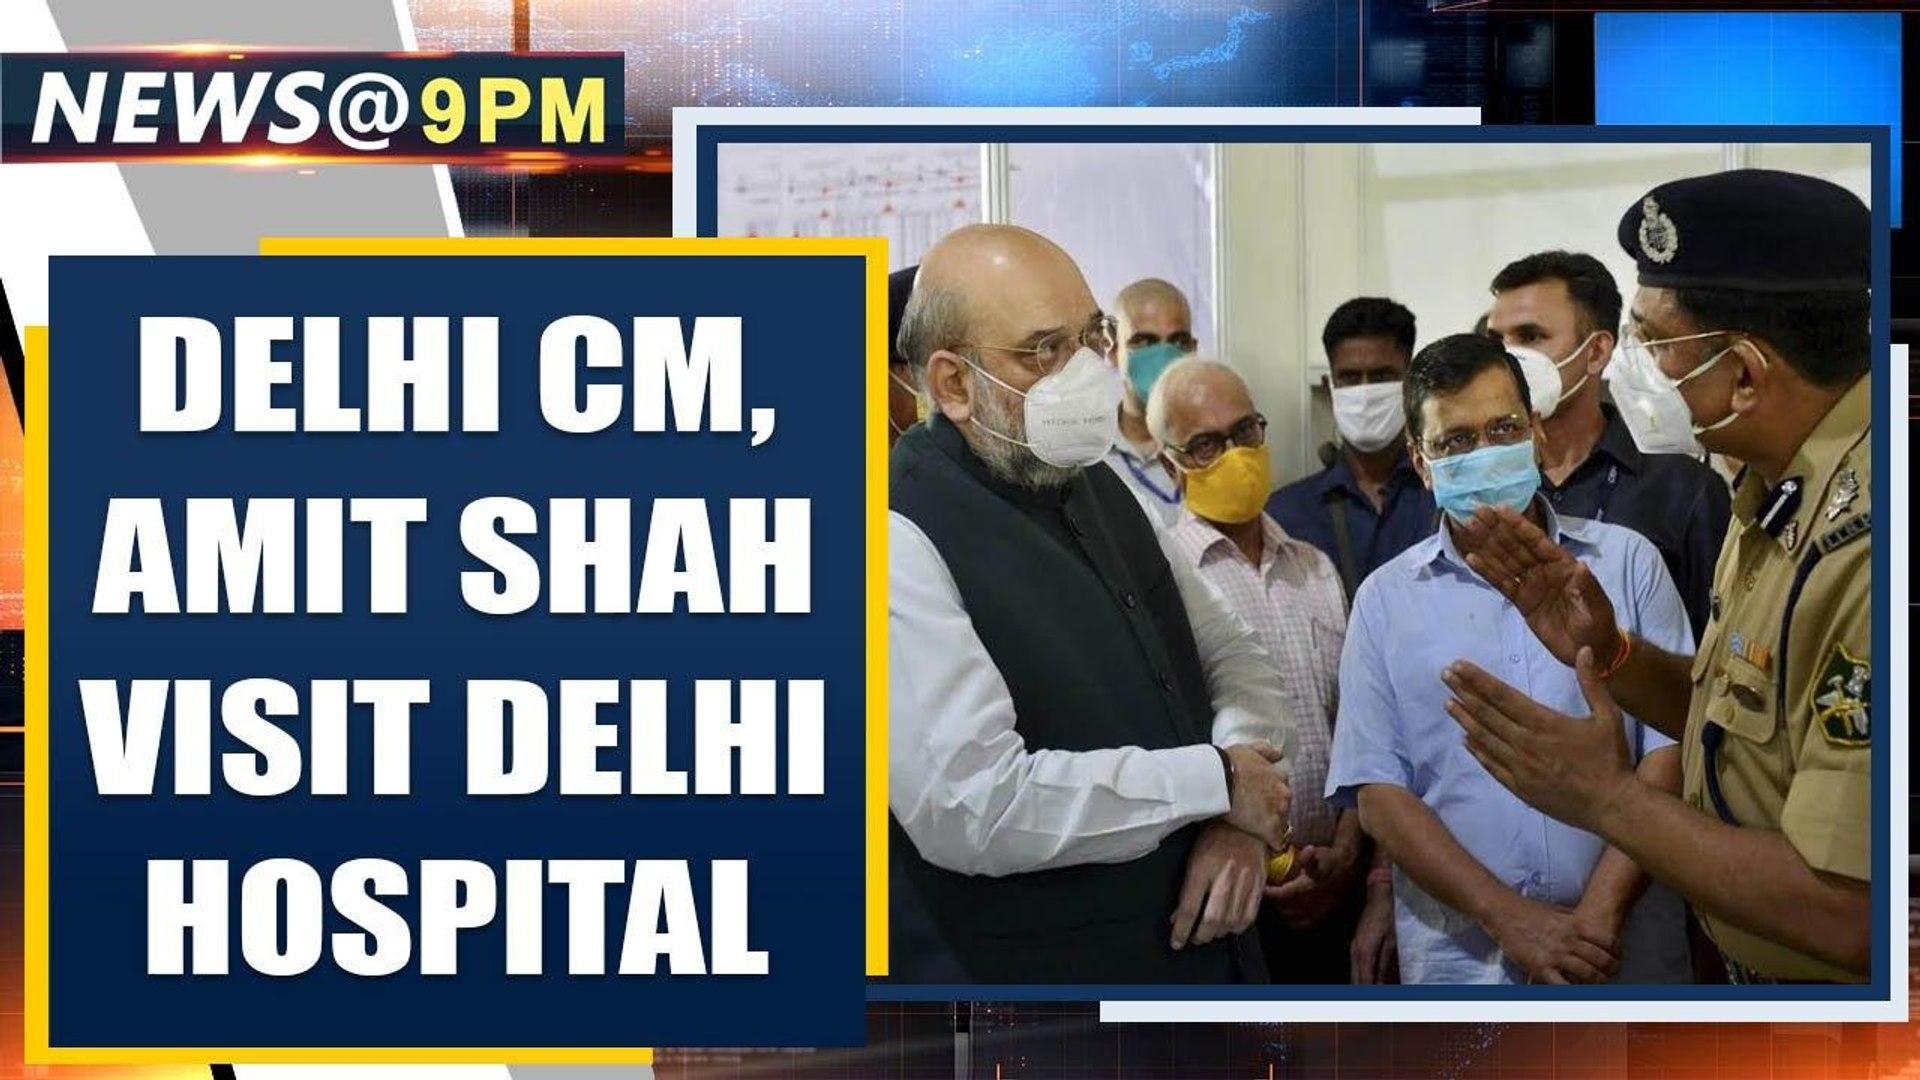 Covid-19: Amit Shaha and Delhi CM Arvind Kejriwal visit Delhi Covid-19 hospital | Oneindia News